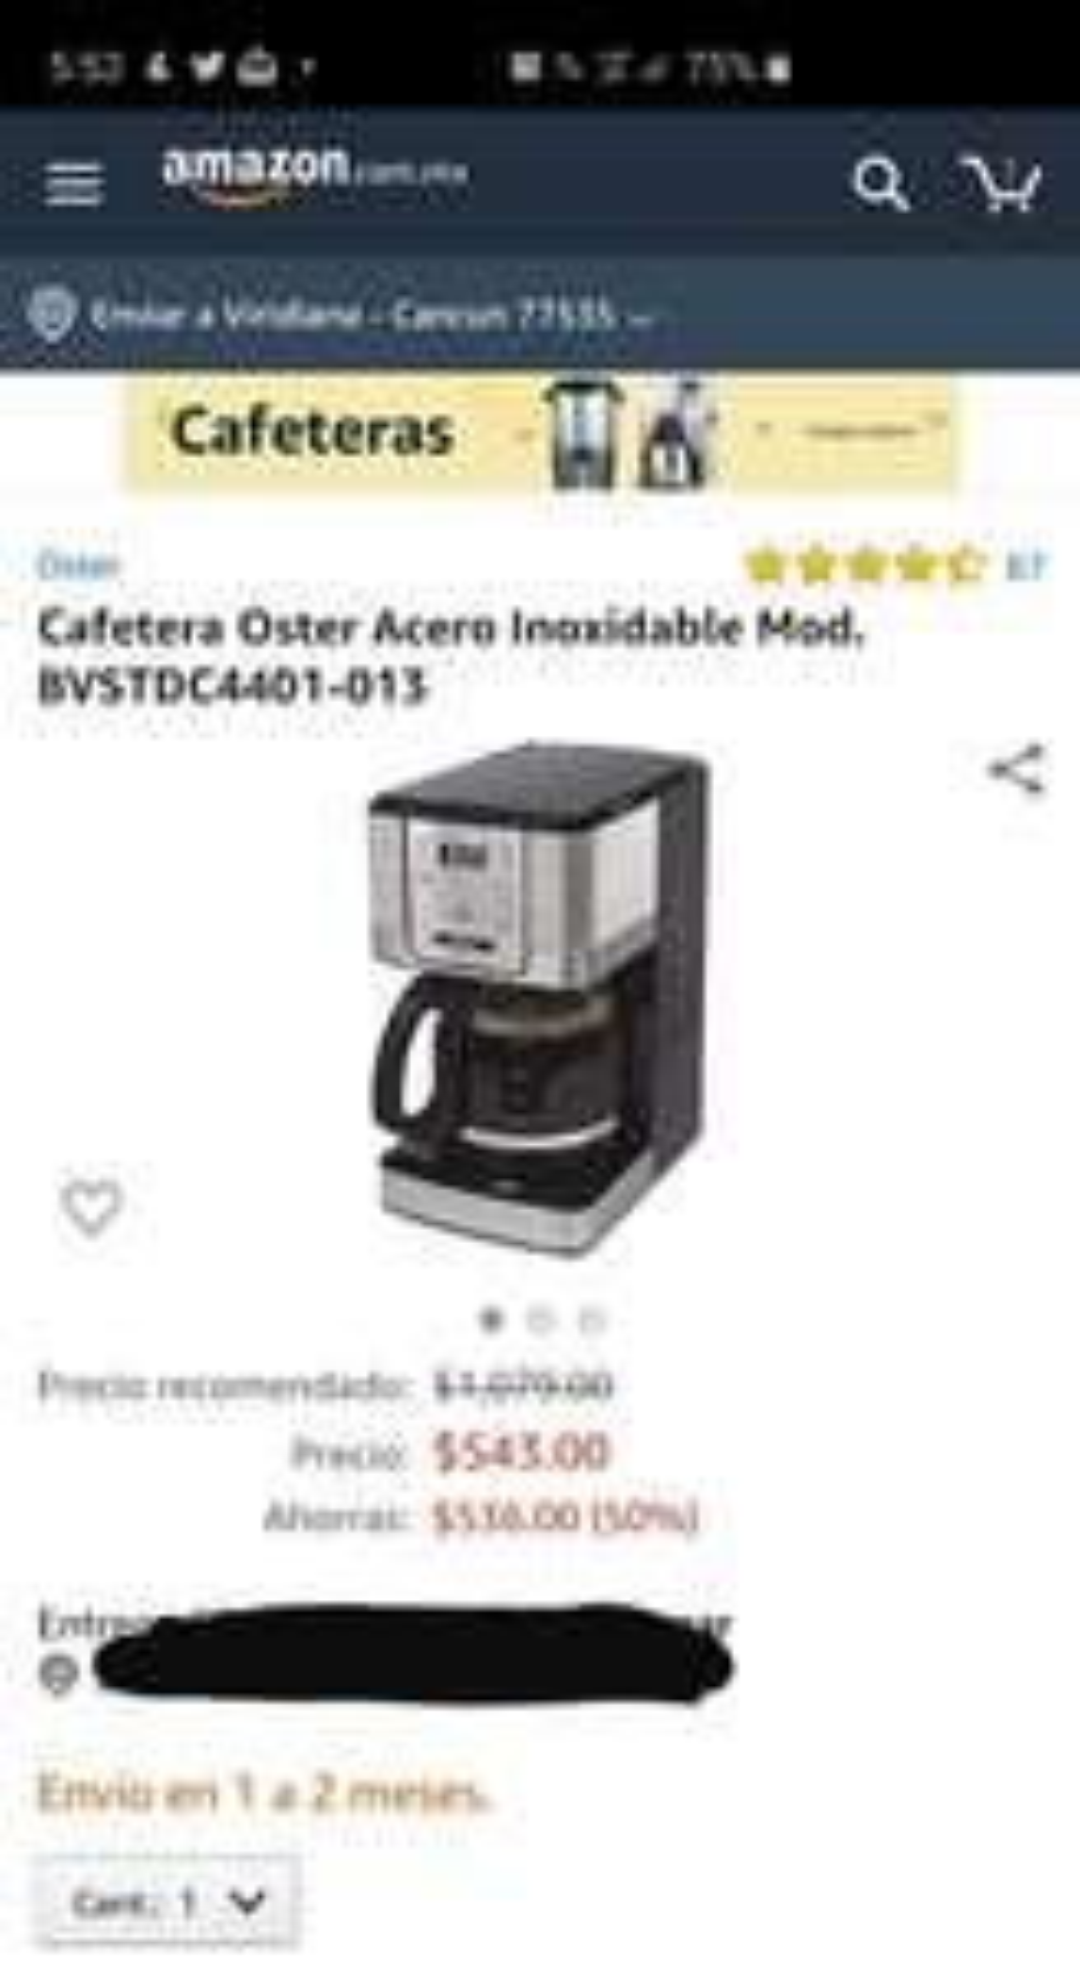 Amazon: Cafetera Oster 12 tazas